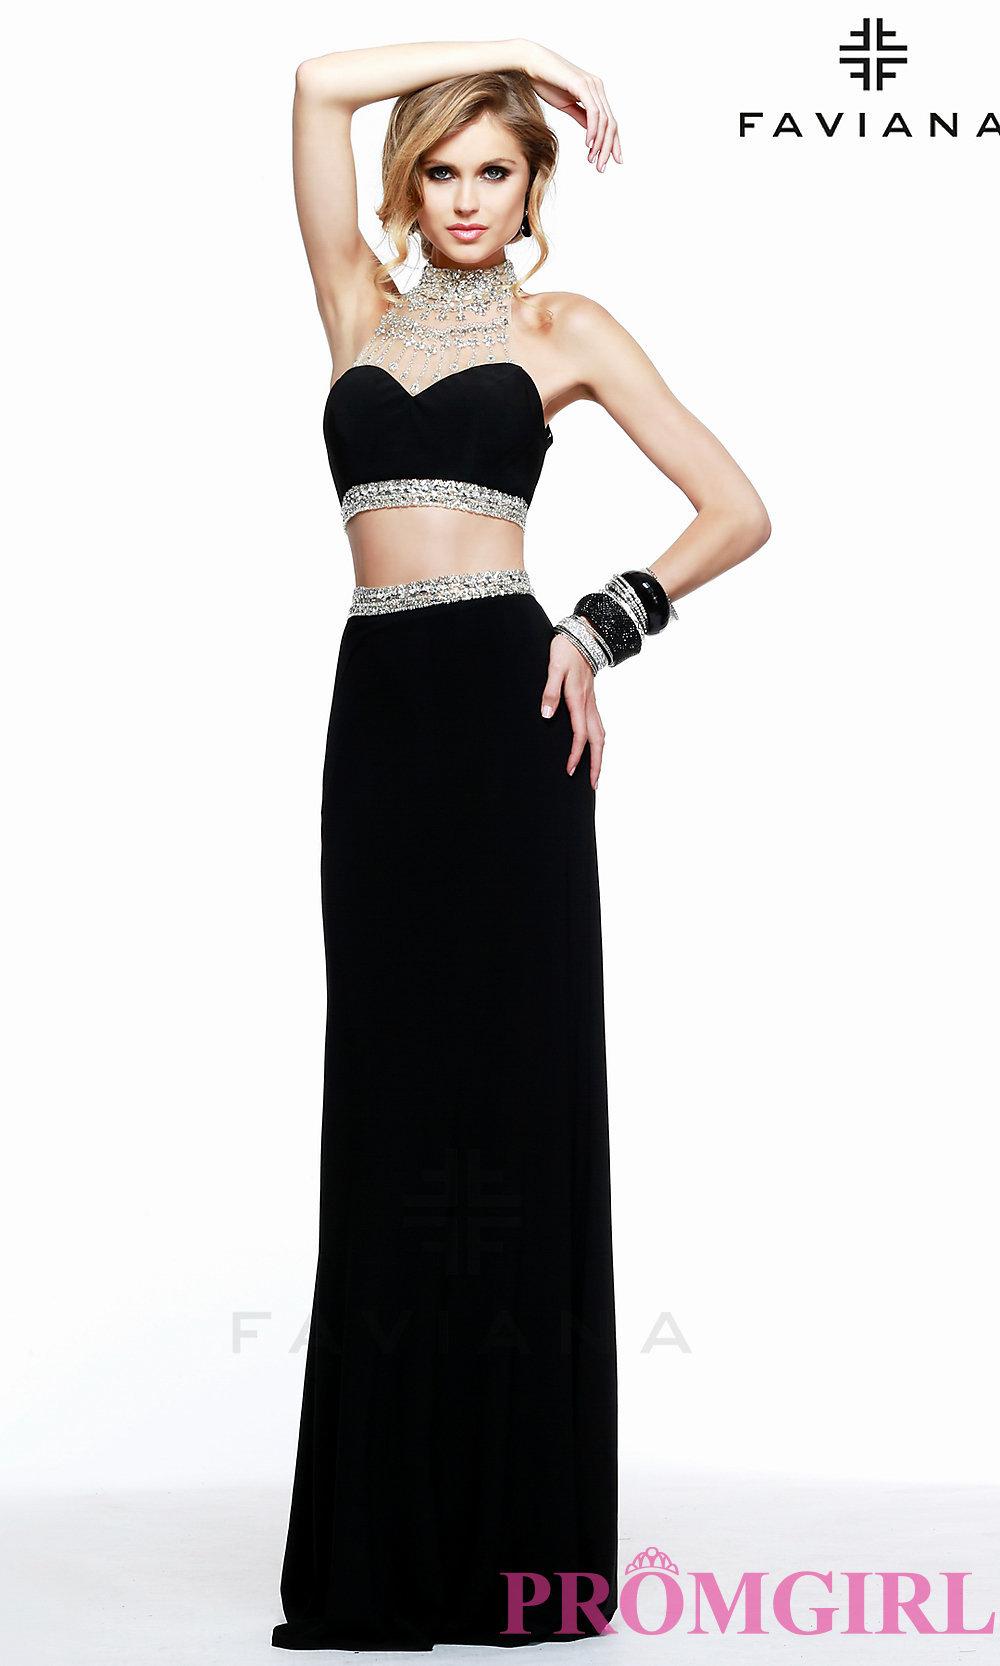 6c1154f21440 Faviana Open Back Two Piece Beaded Prom Dress